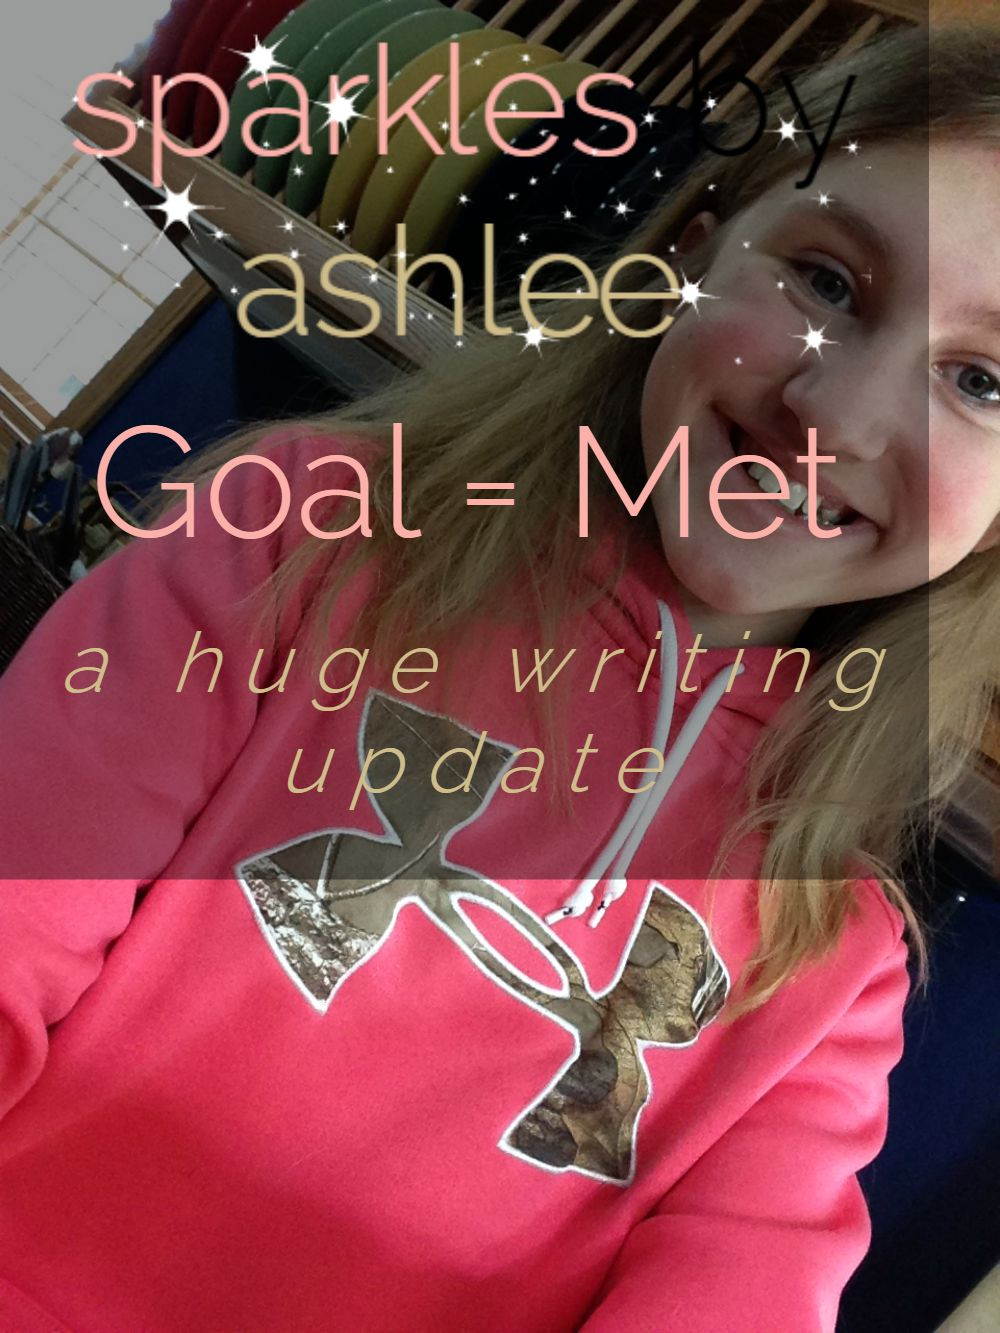 Goal-Equals-Met-Sparkles-by-Ashlee.jpg